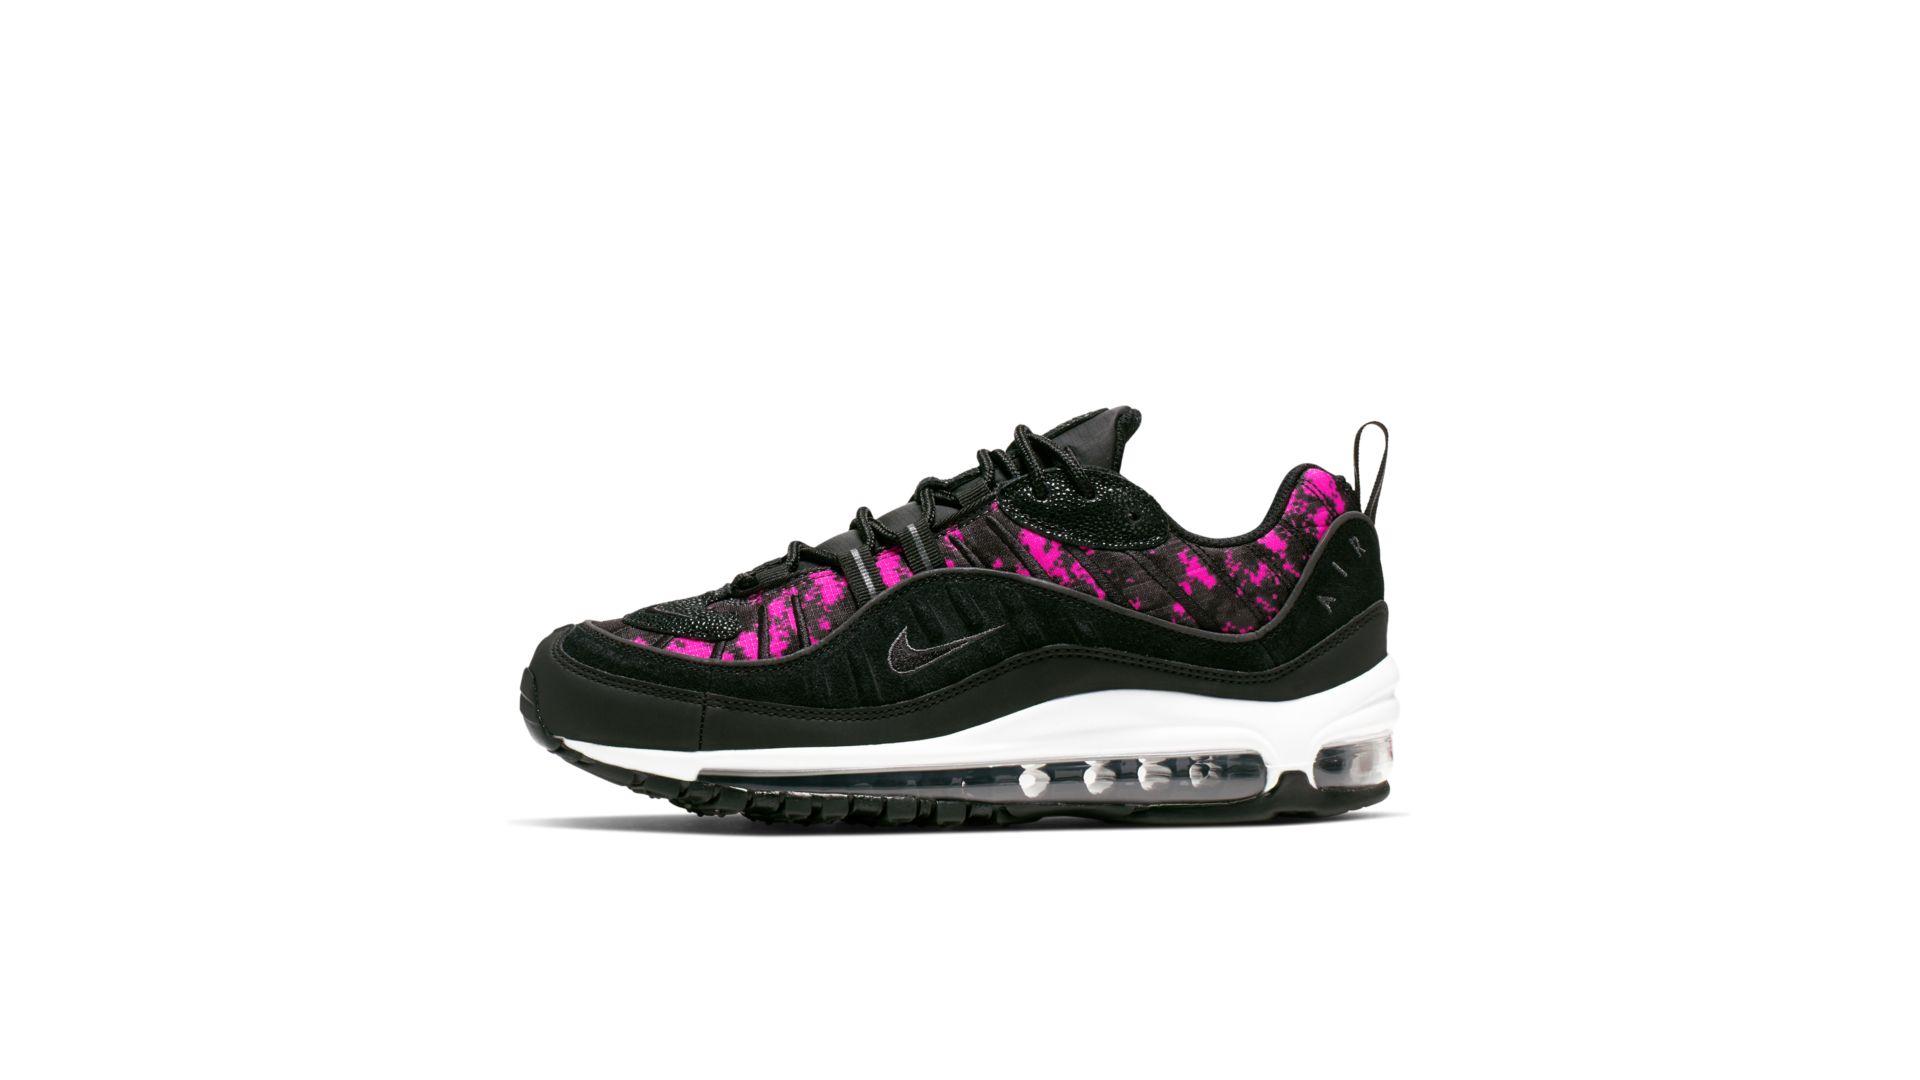 Nike Air Max 98 Pixel Black Hyper Pink (W) (CI2672-001)